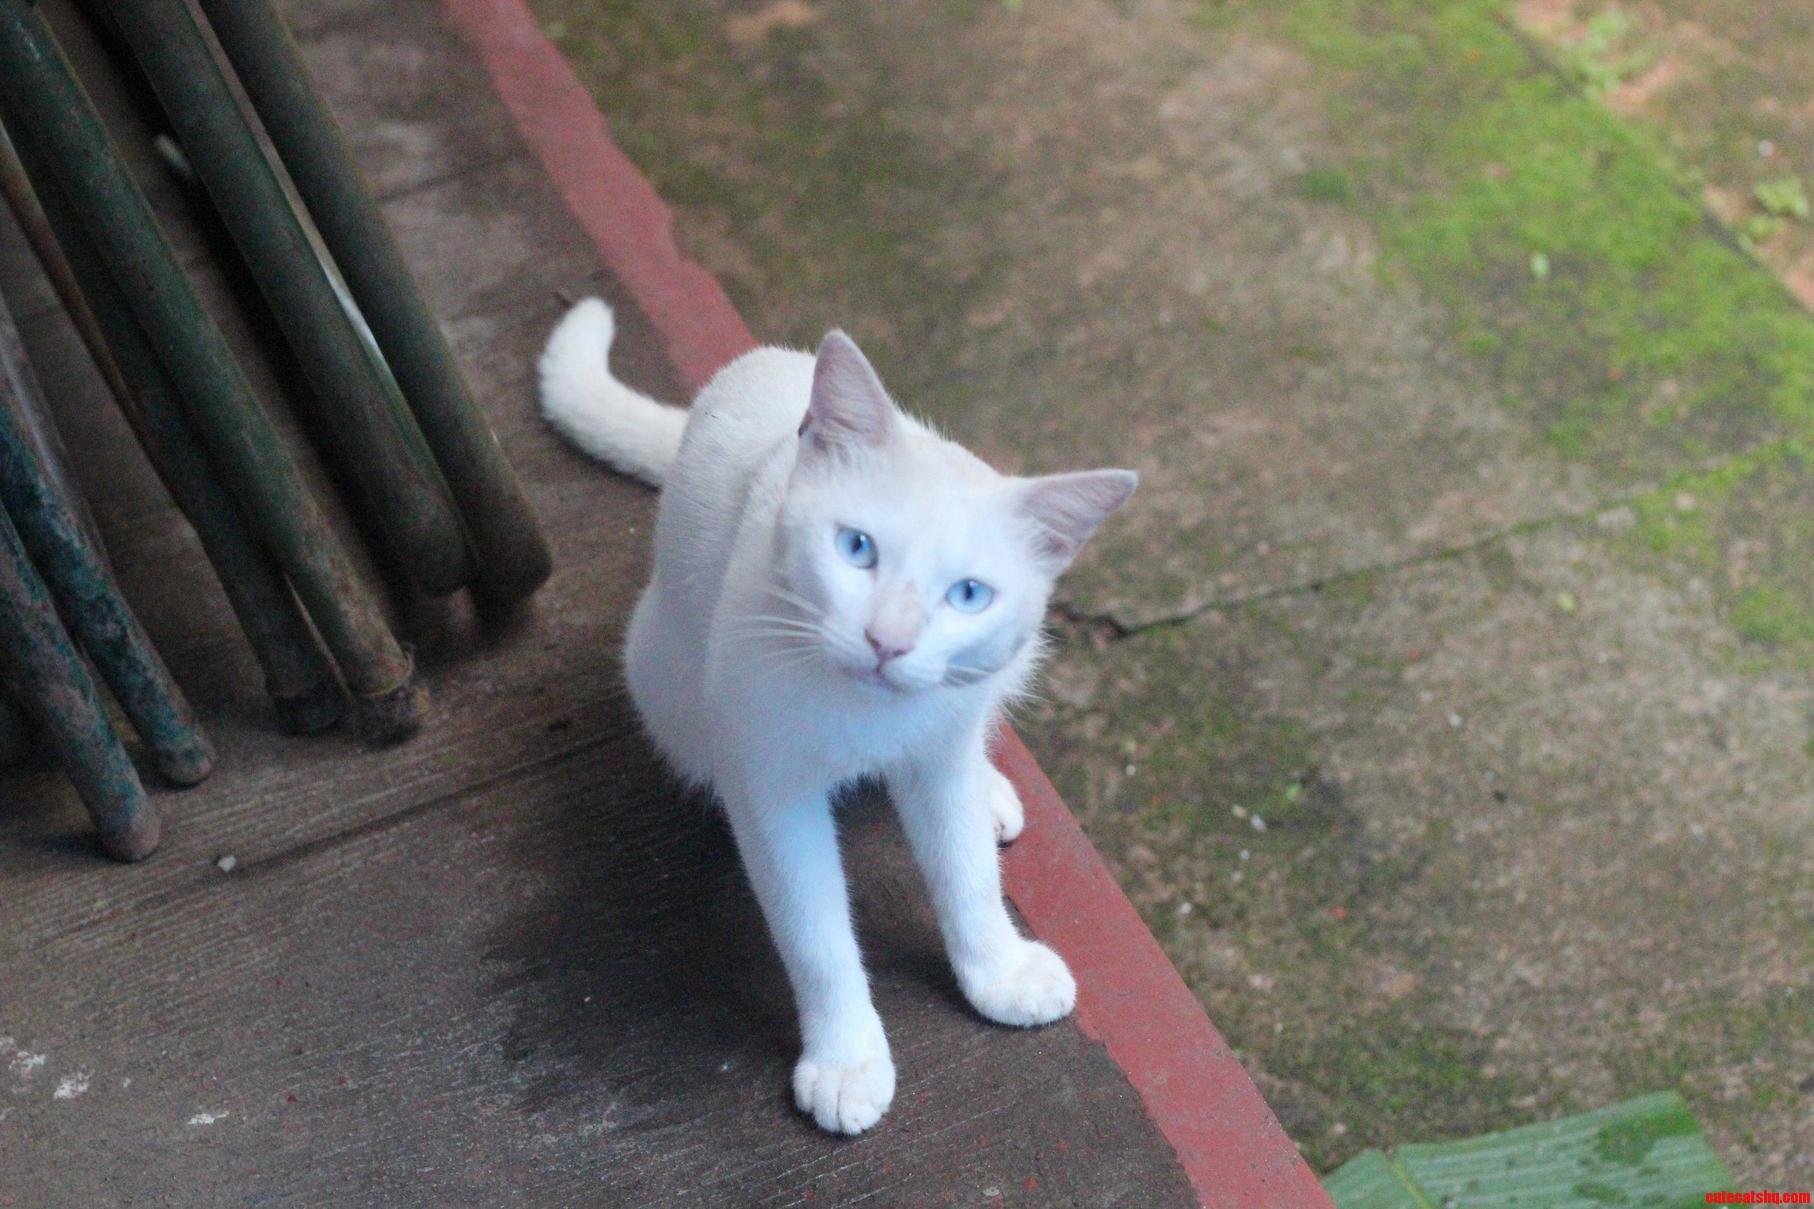 An albino cat with beautiful eyes.